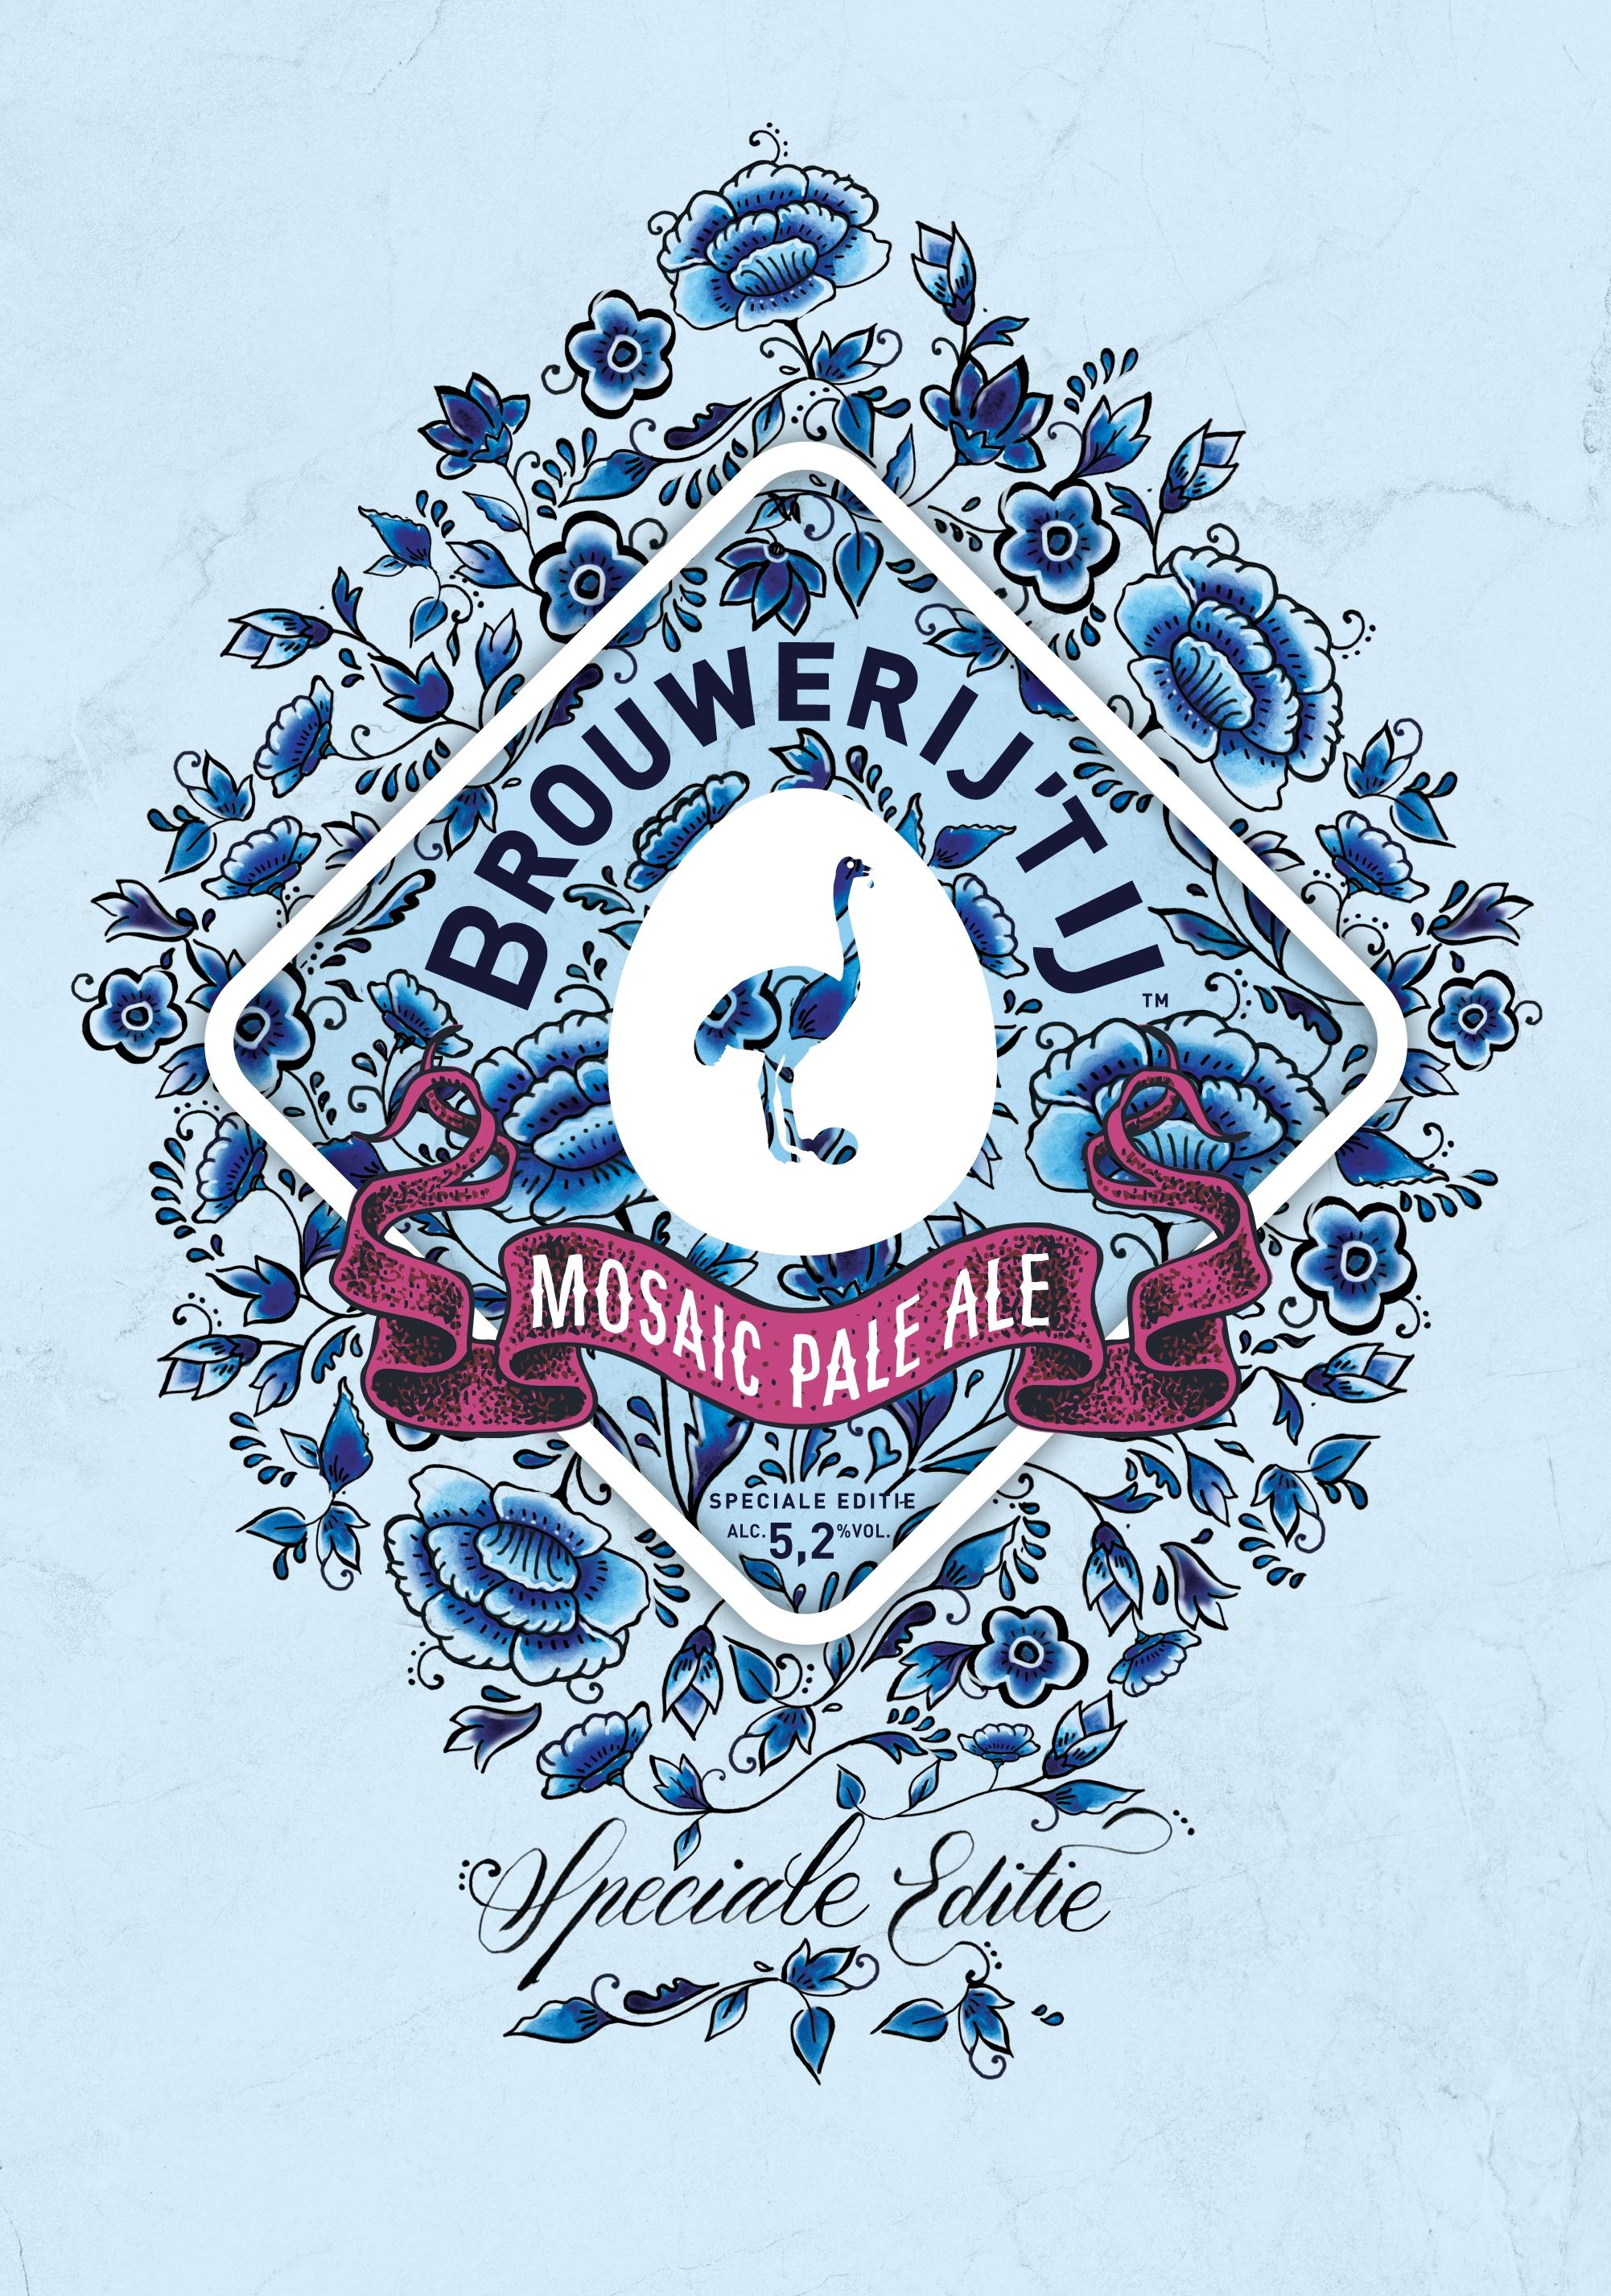 Mosaic Pale Ale Brouwerij 't IJ